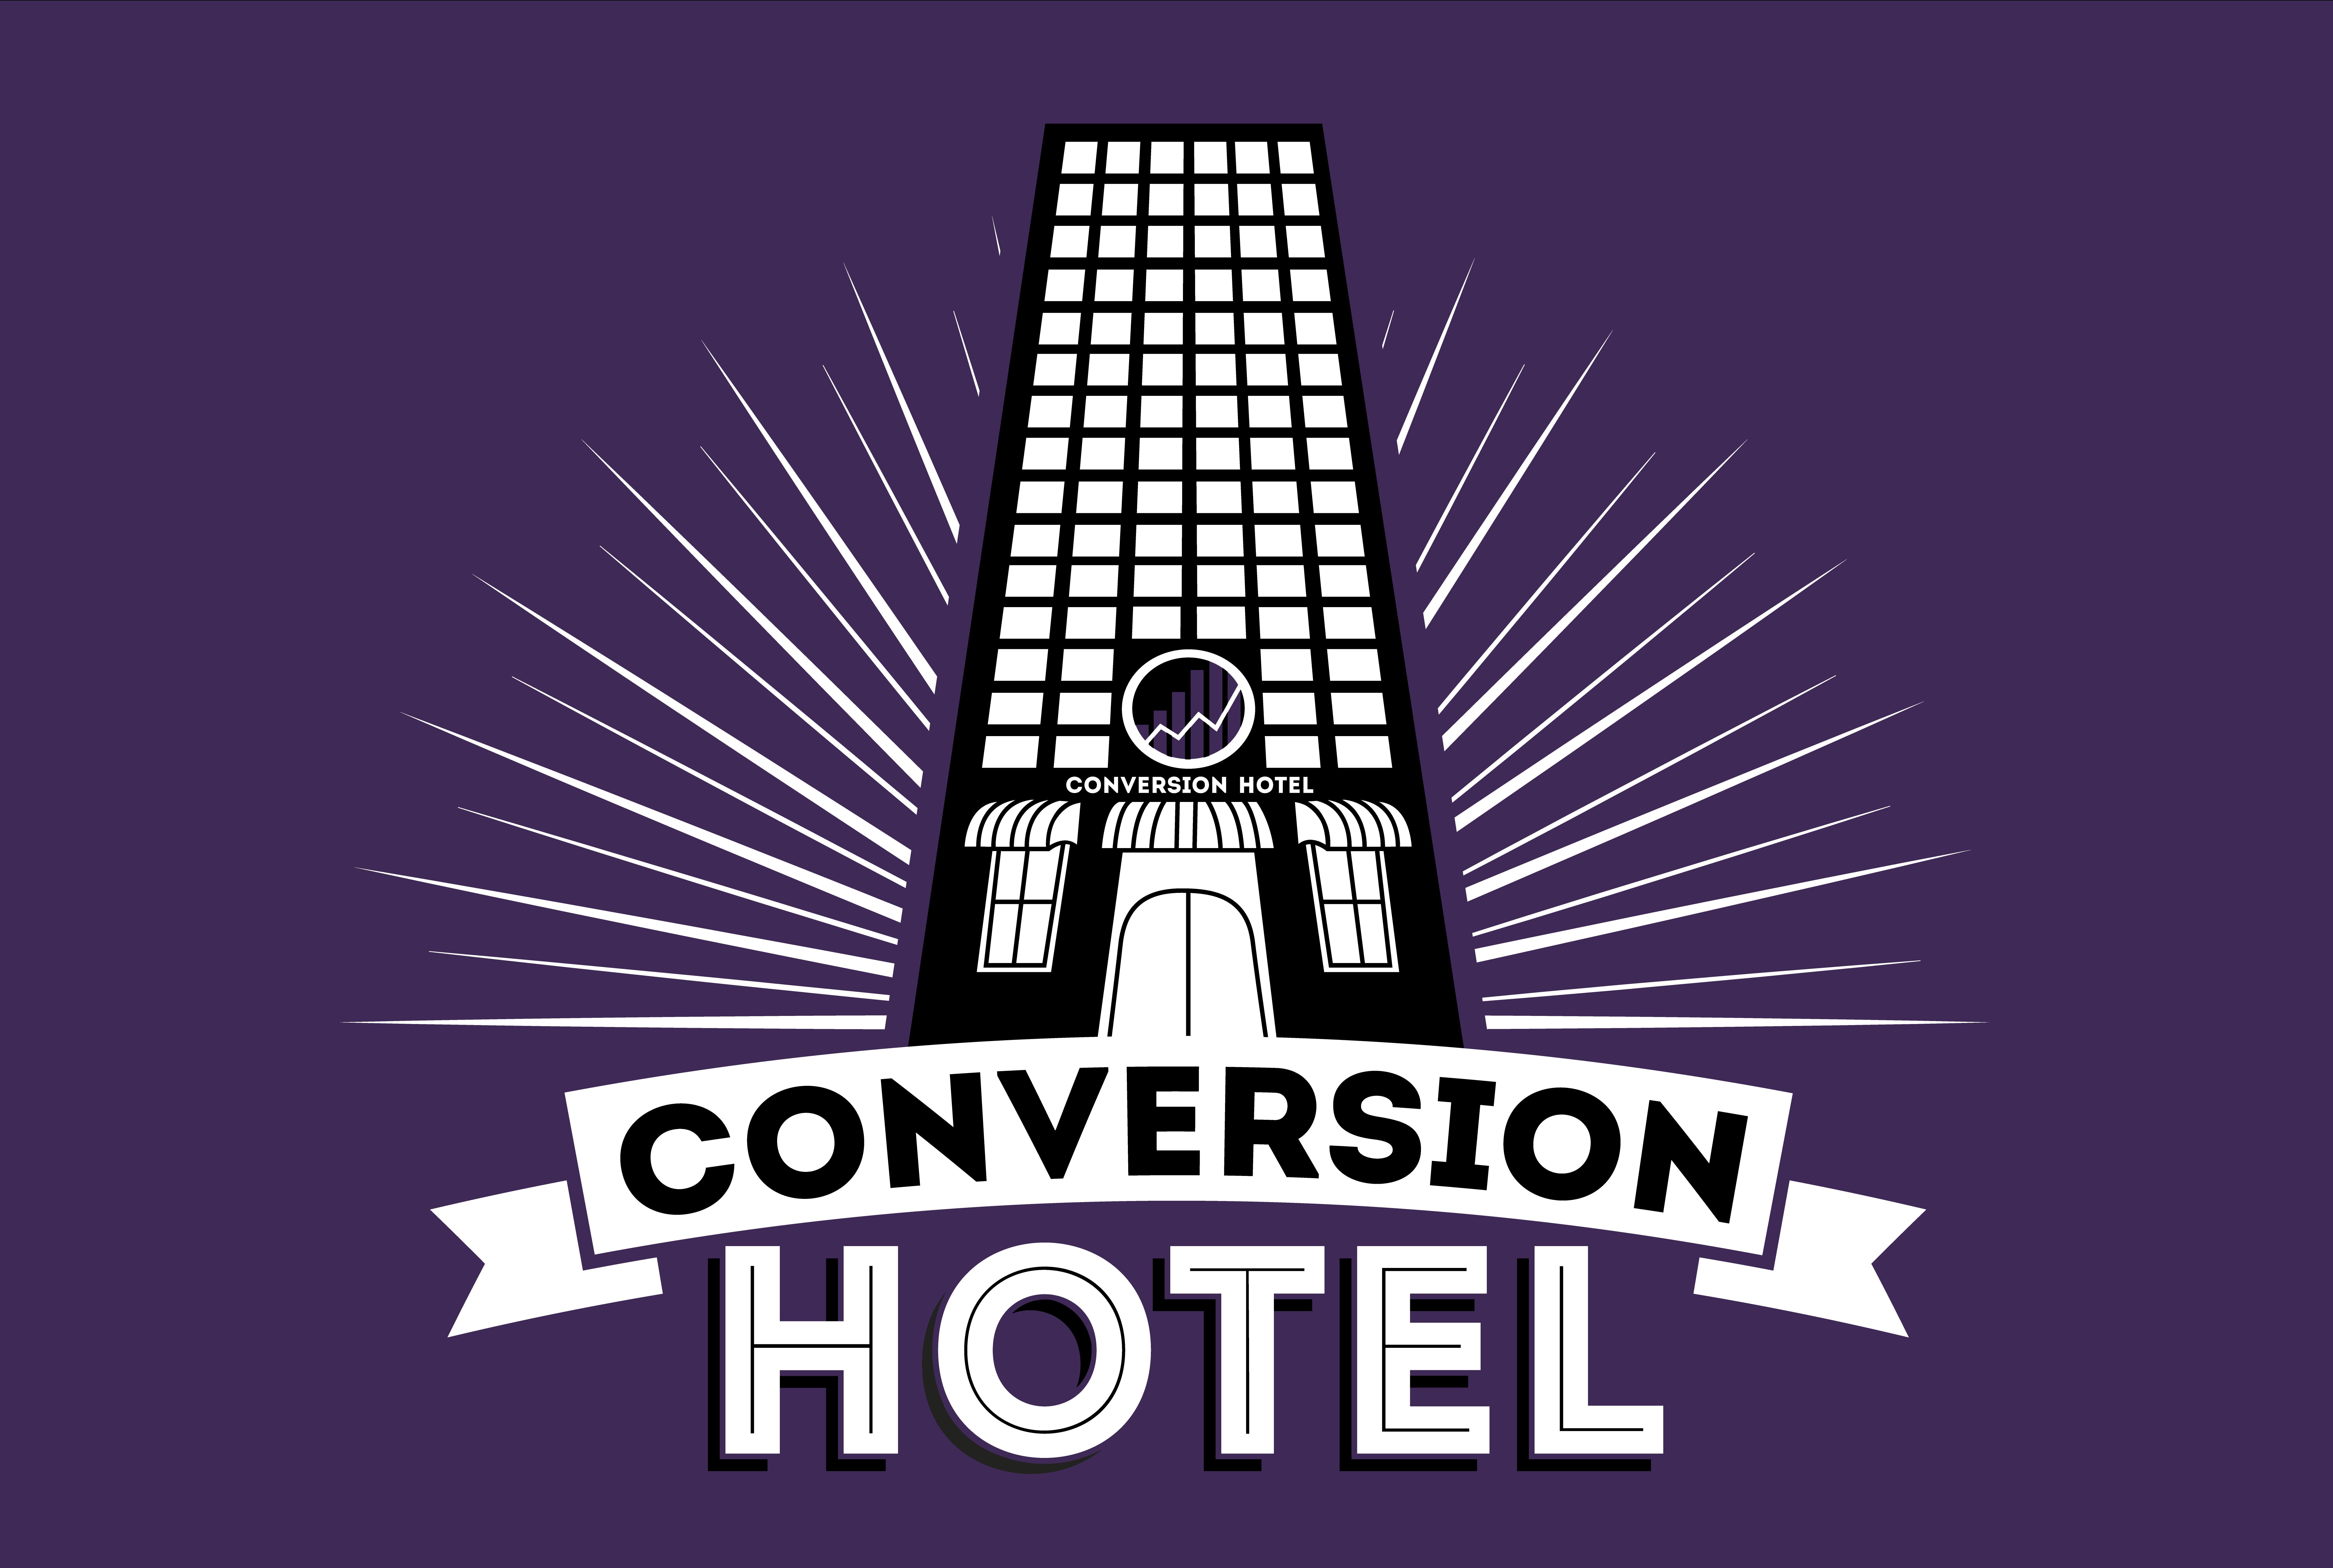 conversion hotel 2017 speakers schedule 17 19 nov 2017 - Purple Hotel 2016